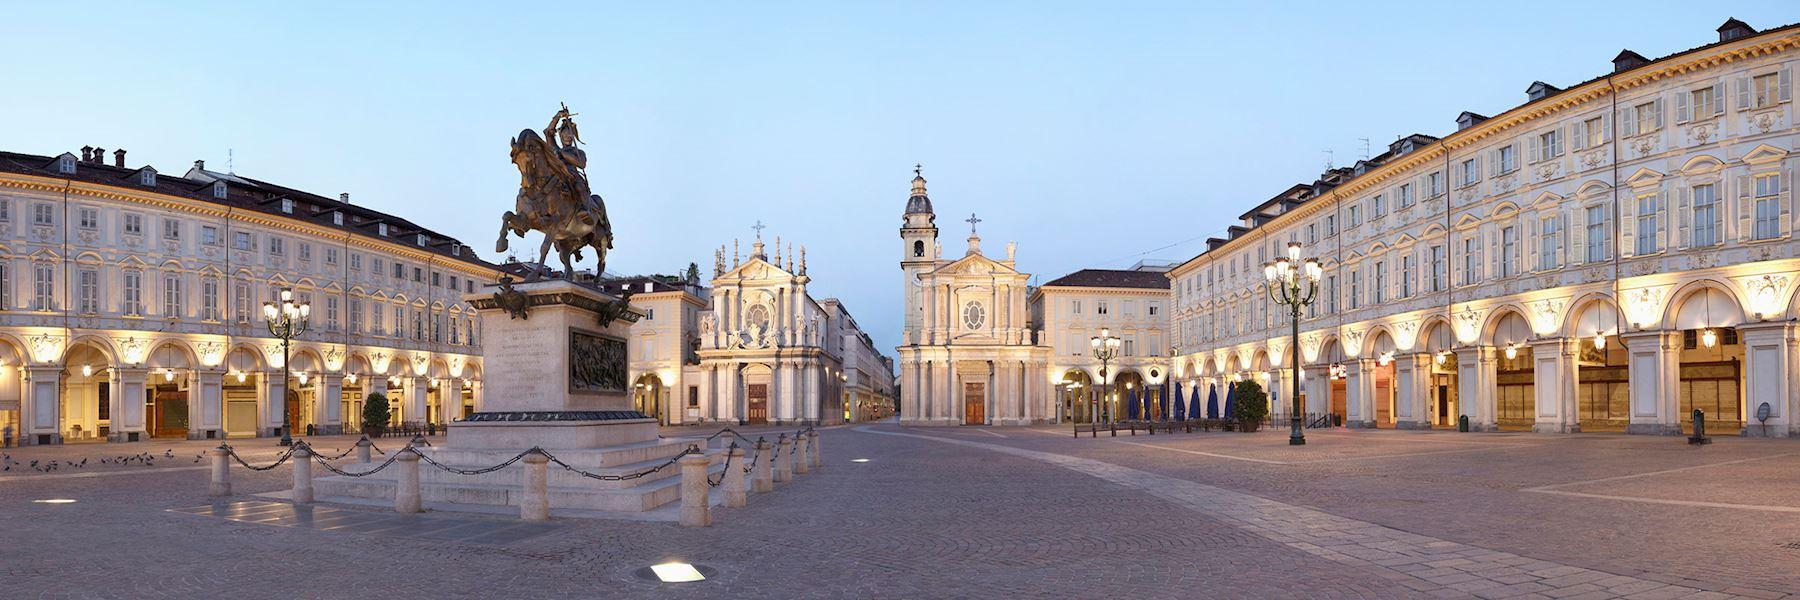 Visit Turin, Italy